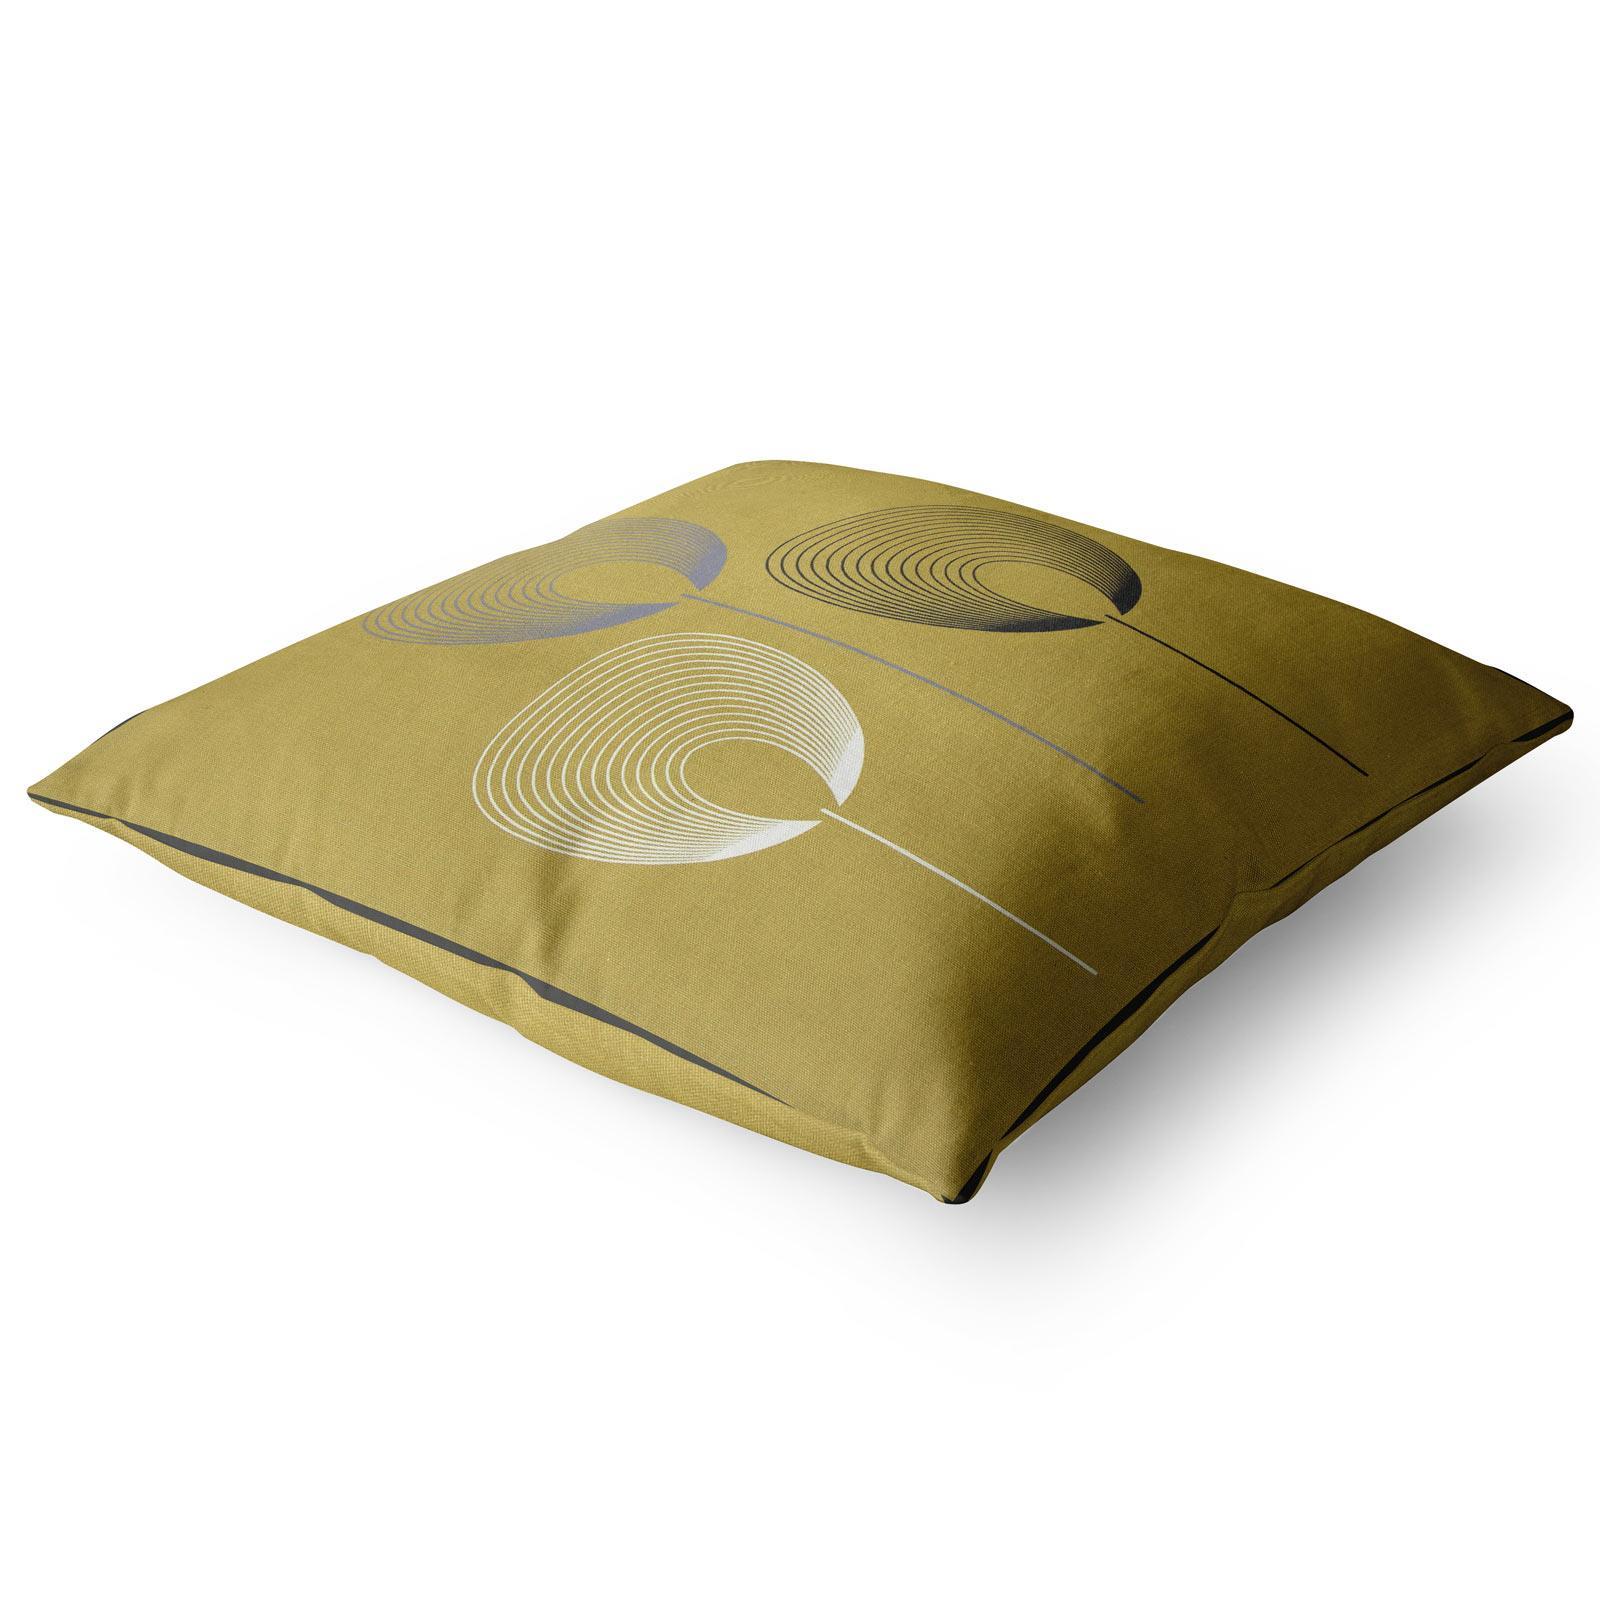 Geometrica-Cushion-Covers-Cojines-De-Impresion-Floral-Gris-Beige-Ocre-cubre-17-034-X-17-034 miniatura 3